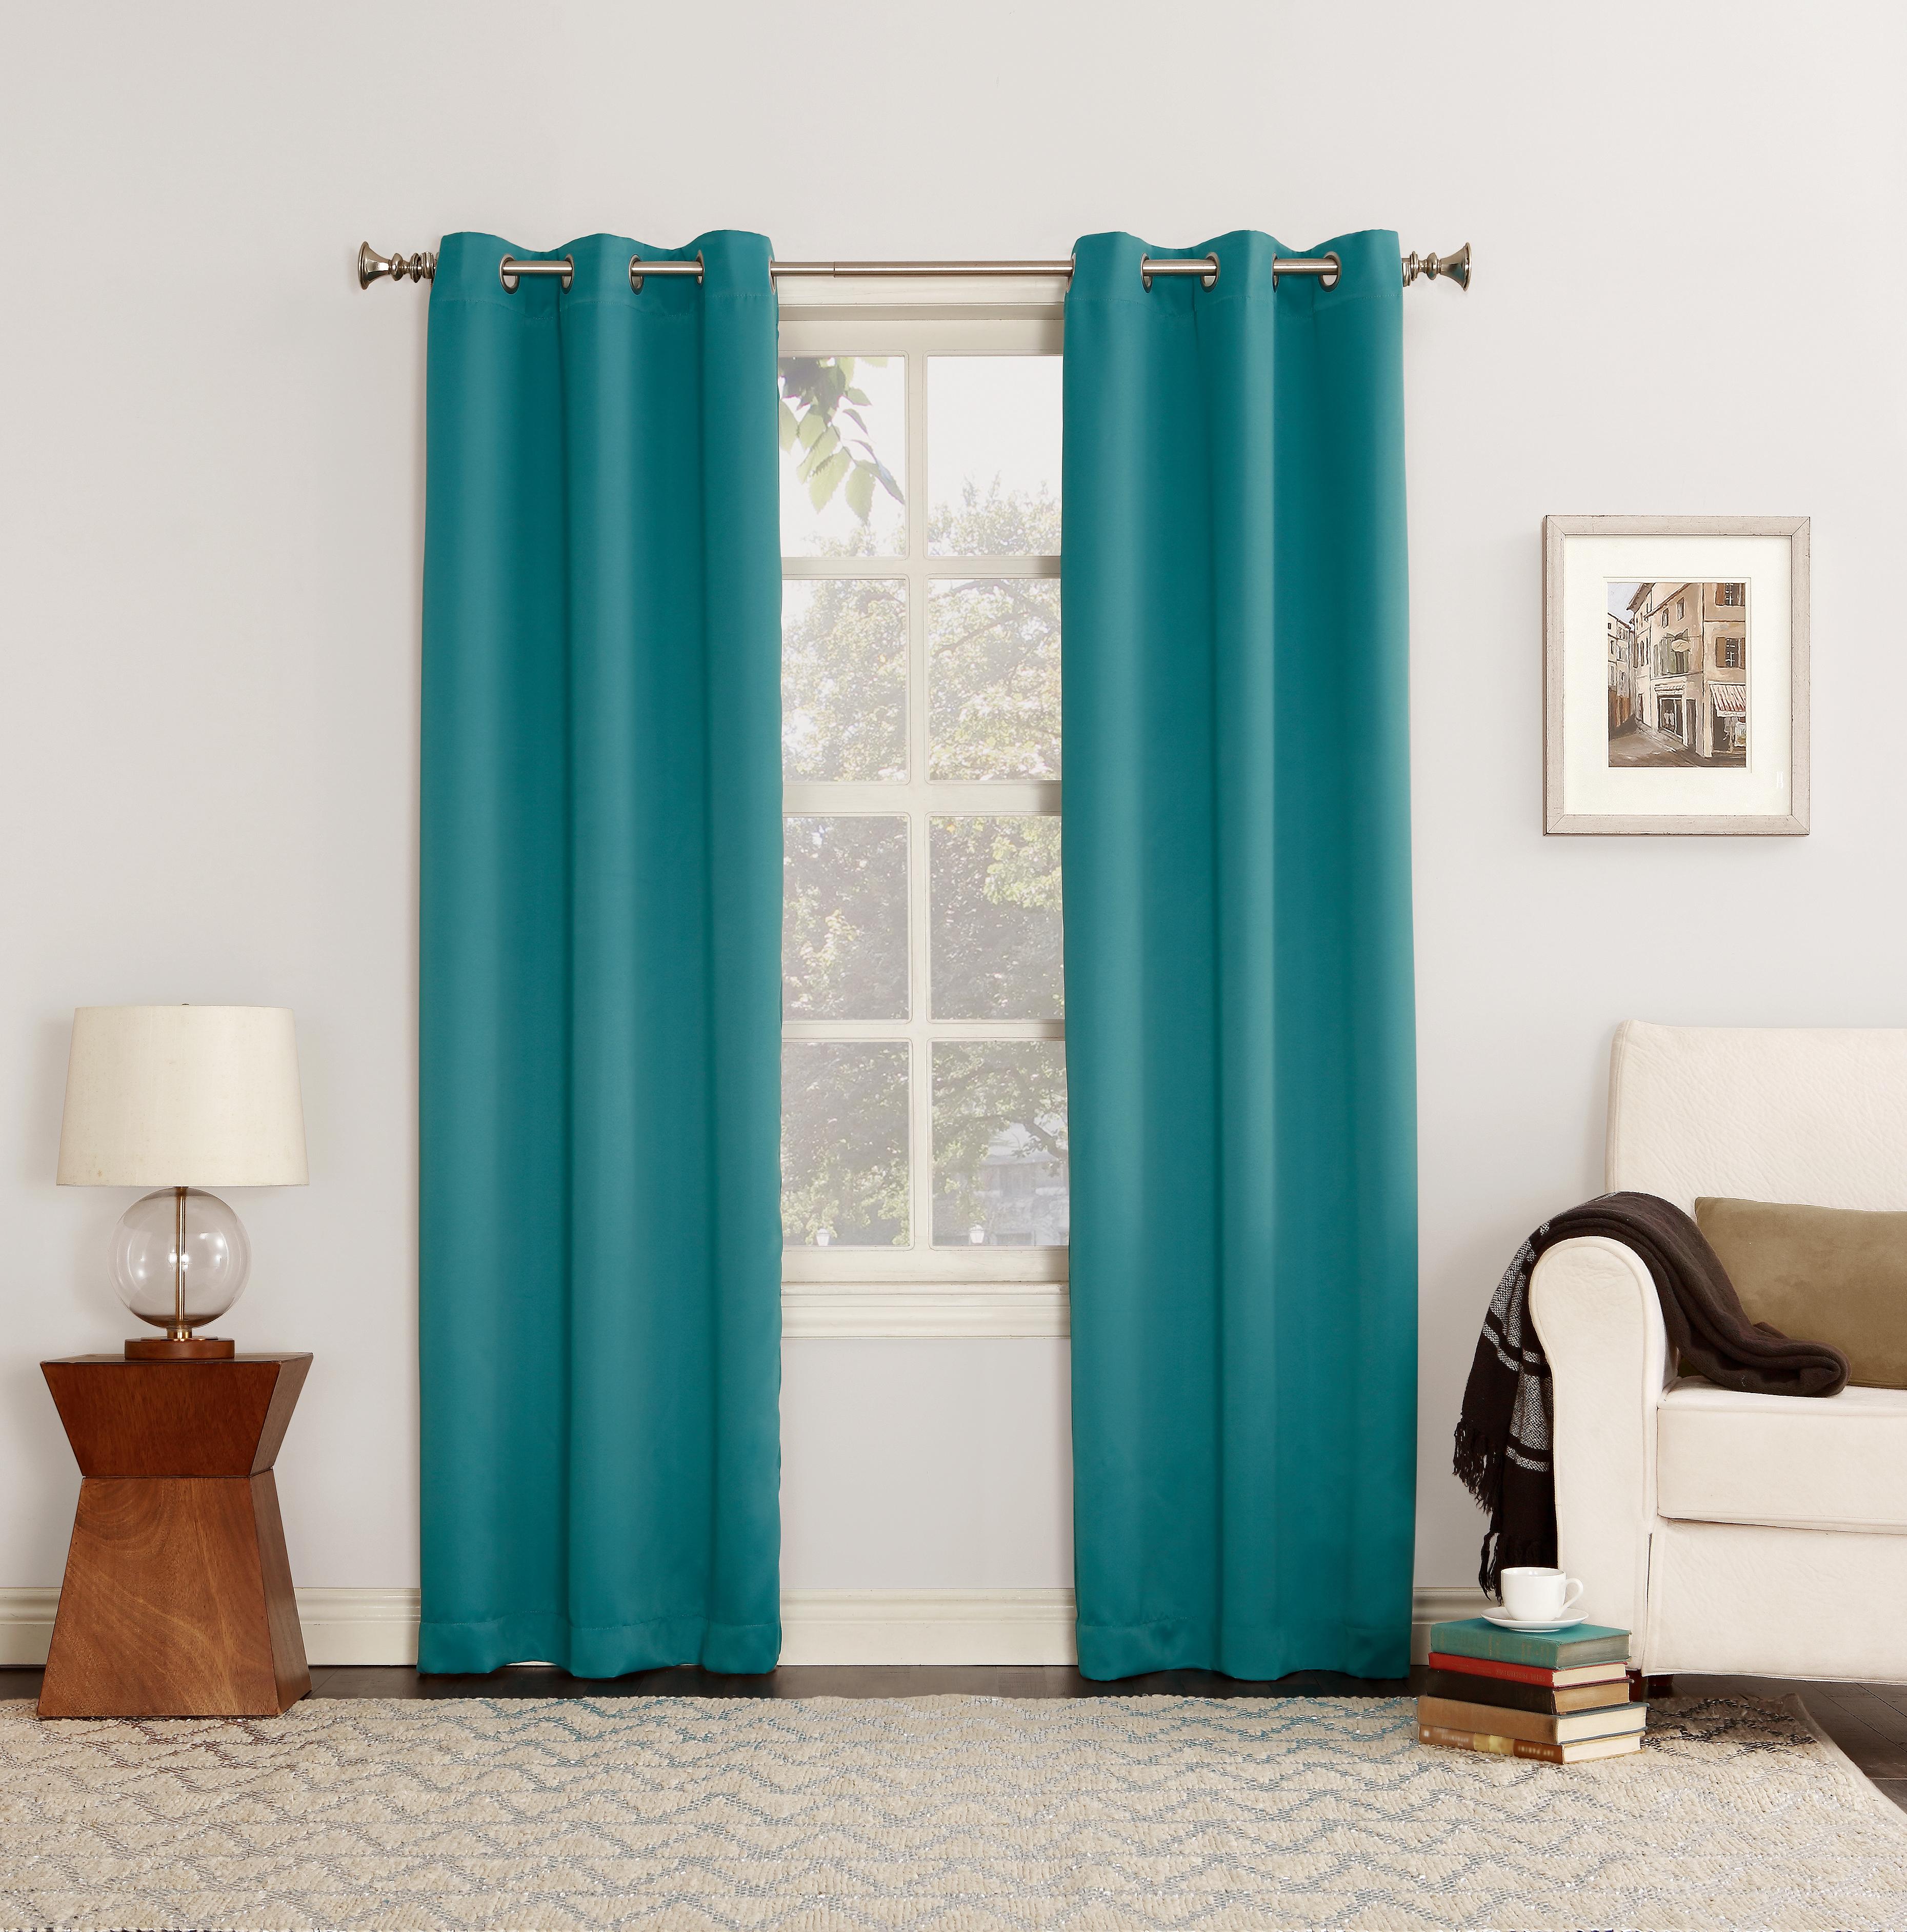 Sun Zero Hayden Grommet Blackout Single Curtain Panel With Regard To Hayden Grommet Blackout Single Curtain Panels (View 7 of 20)